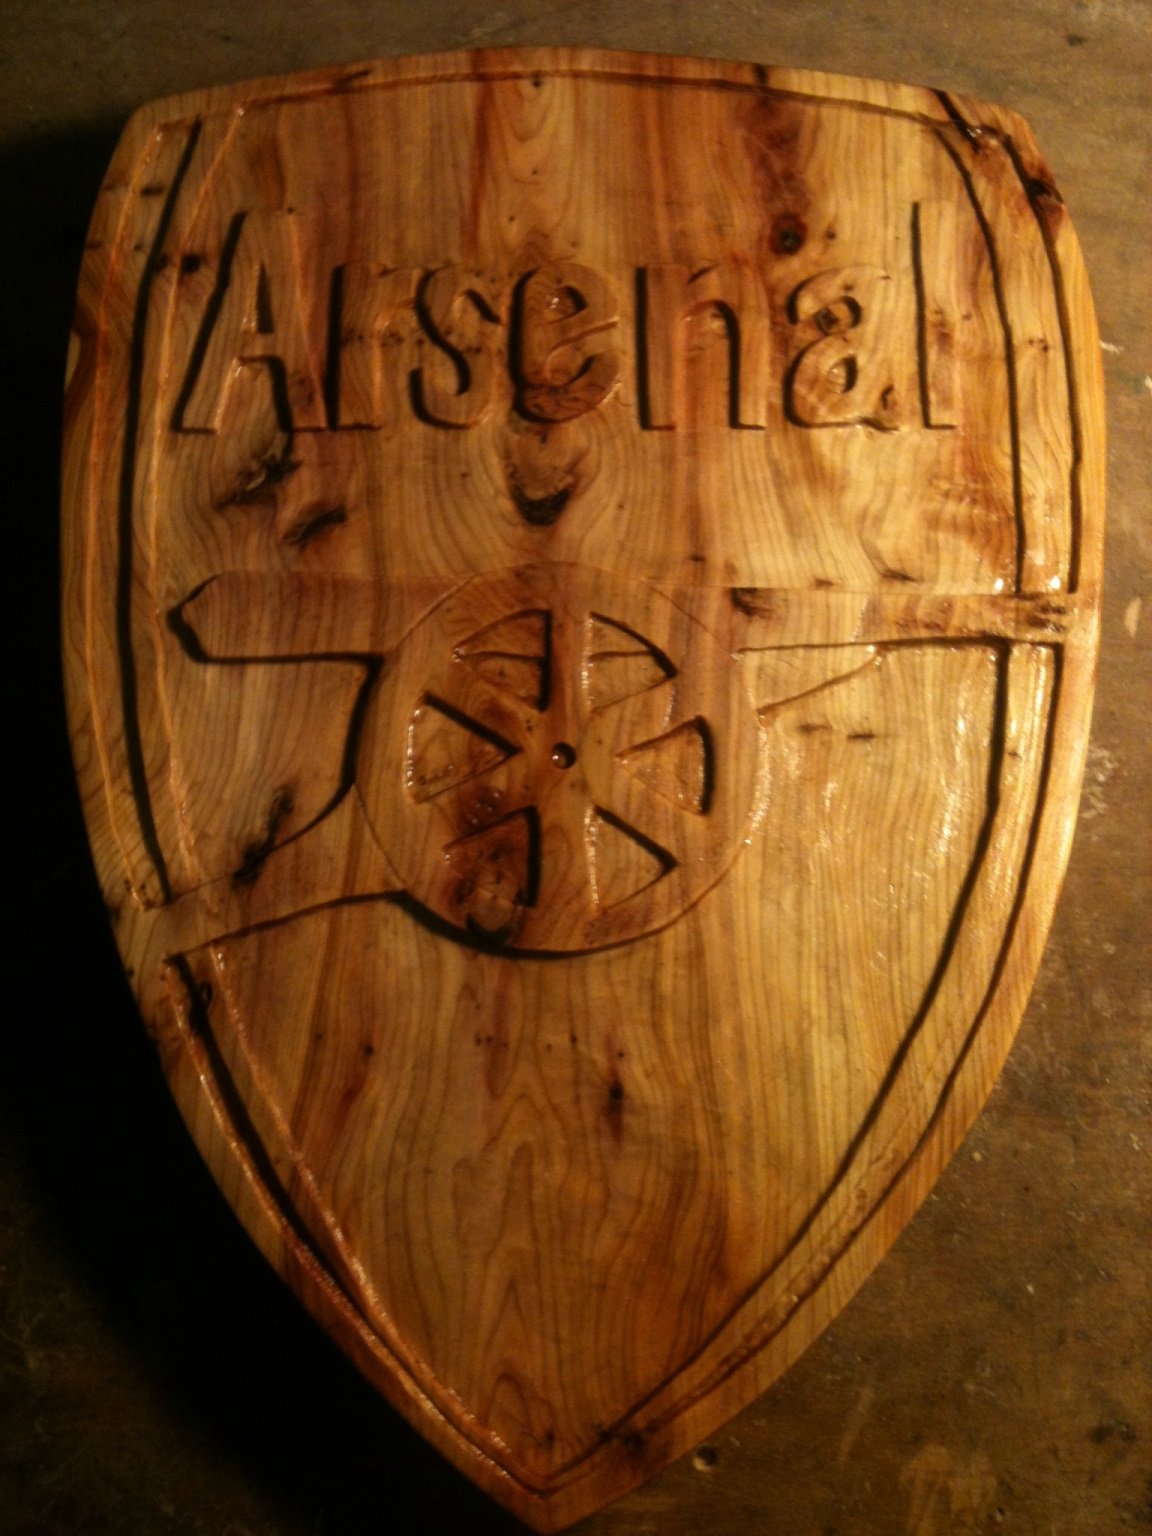 20121122 Arsenal Crest.JPG